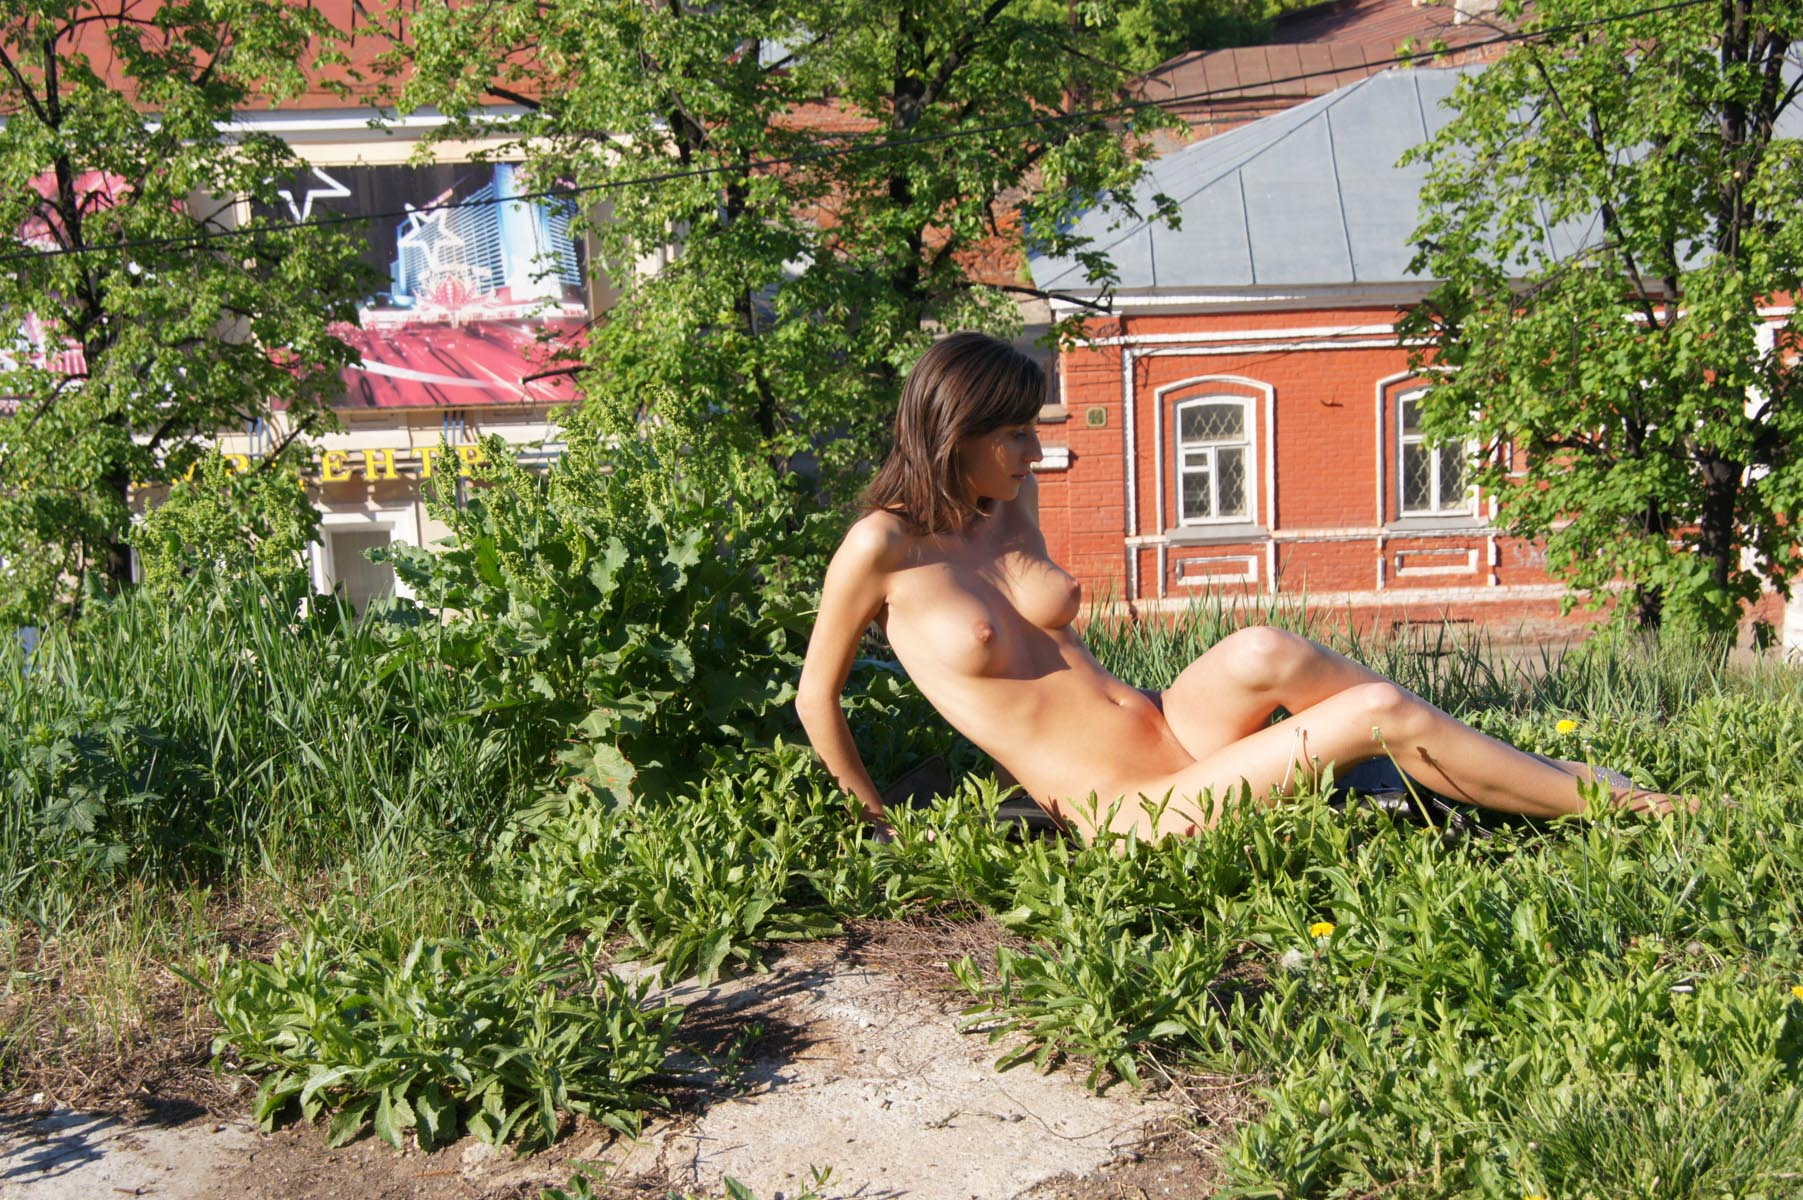 irina-k-naked-in-russia-kazan-nude-public-06